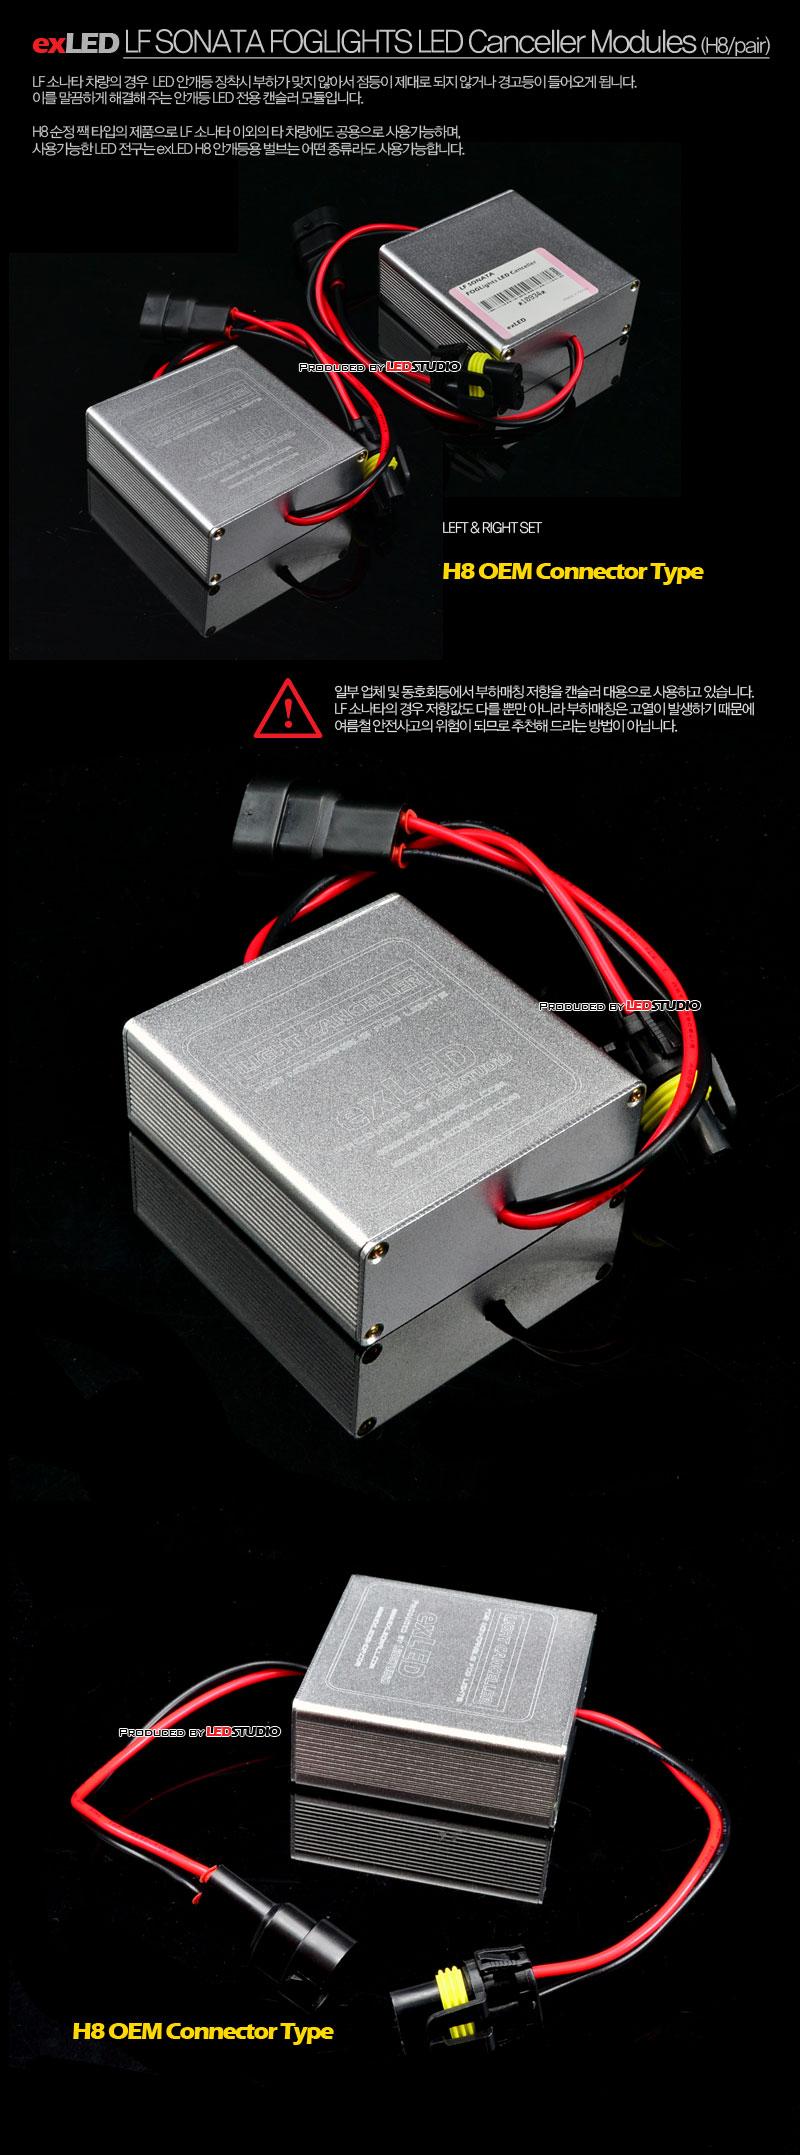 exLED LF 소나타용 안개등 LED 캔슬러 모듈 (좌우측 1대분)